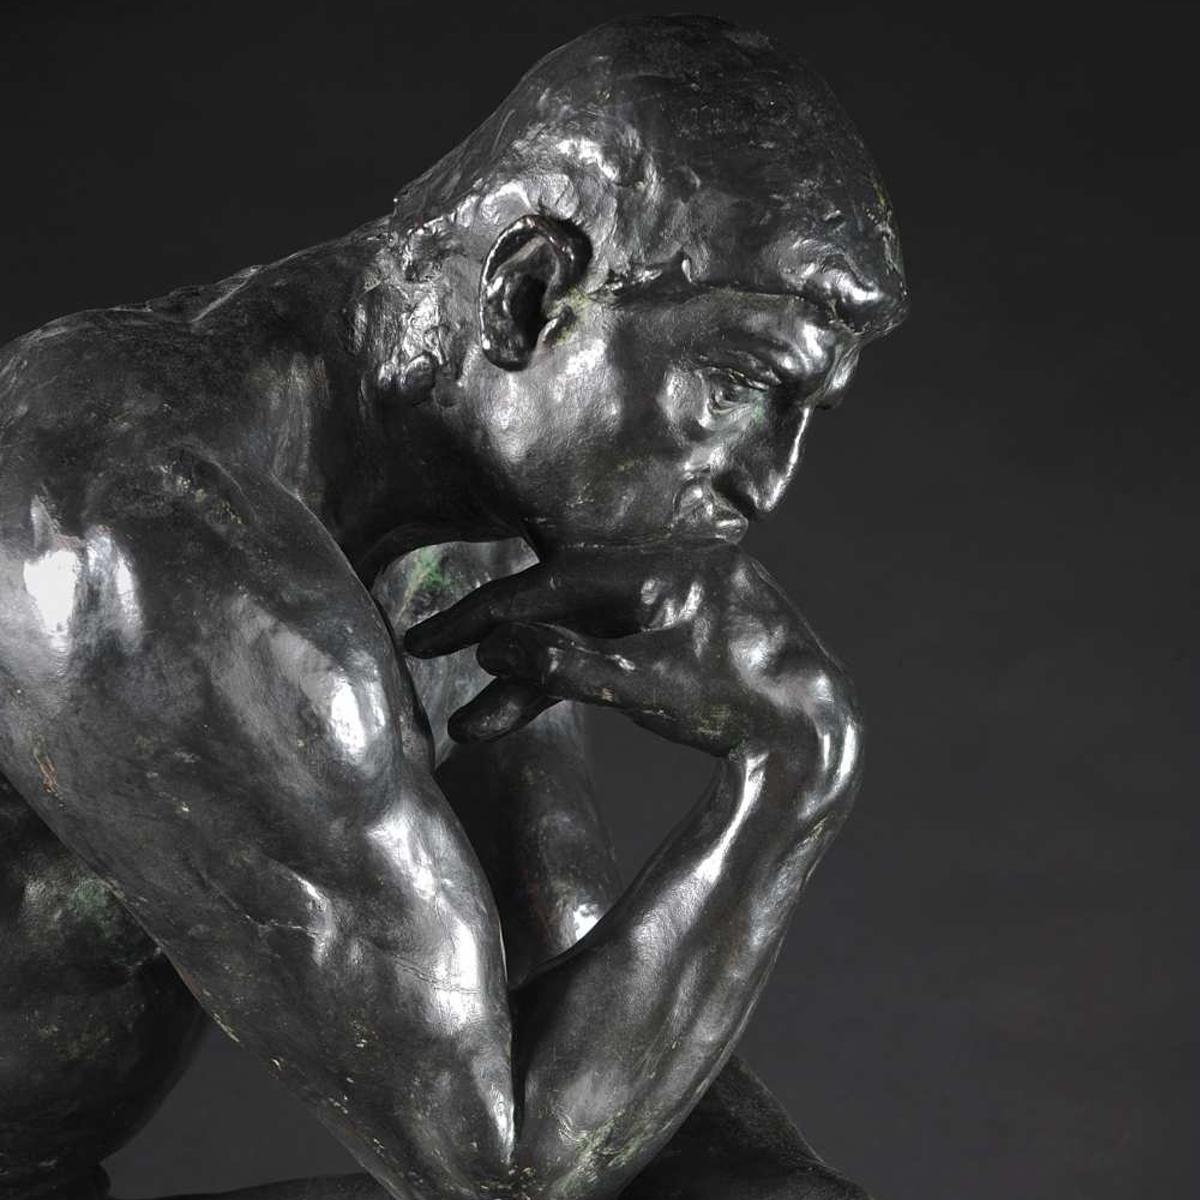 Auguste Rodin, The Thinker, 1881-83, Detail, Nationalgalerie, Staatlichen Museen zu Berlin Andreas Kilger